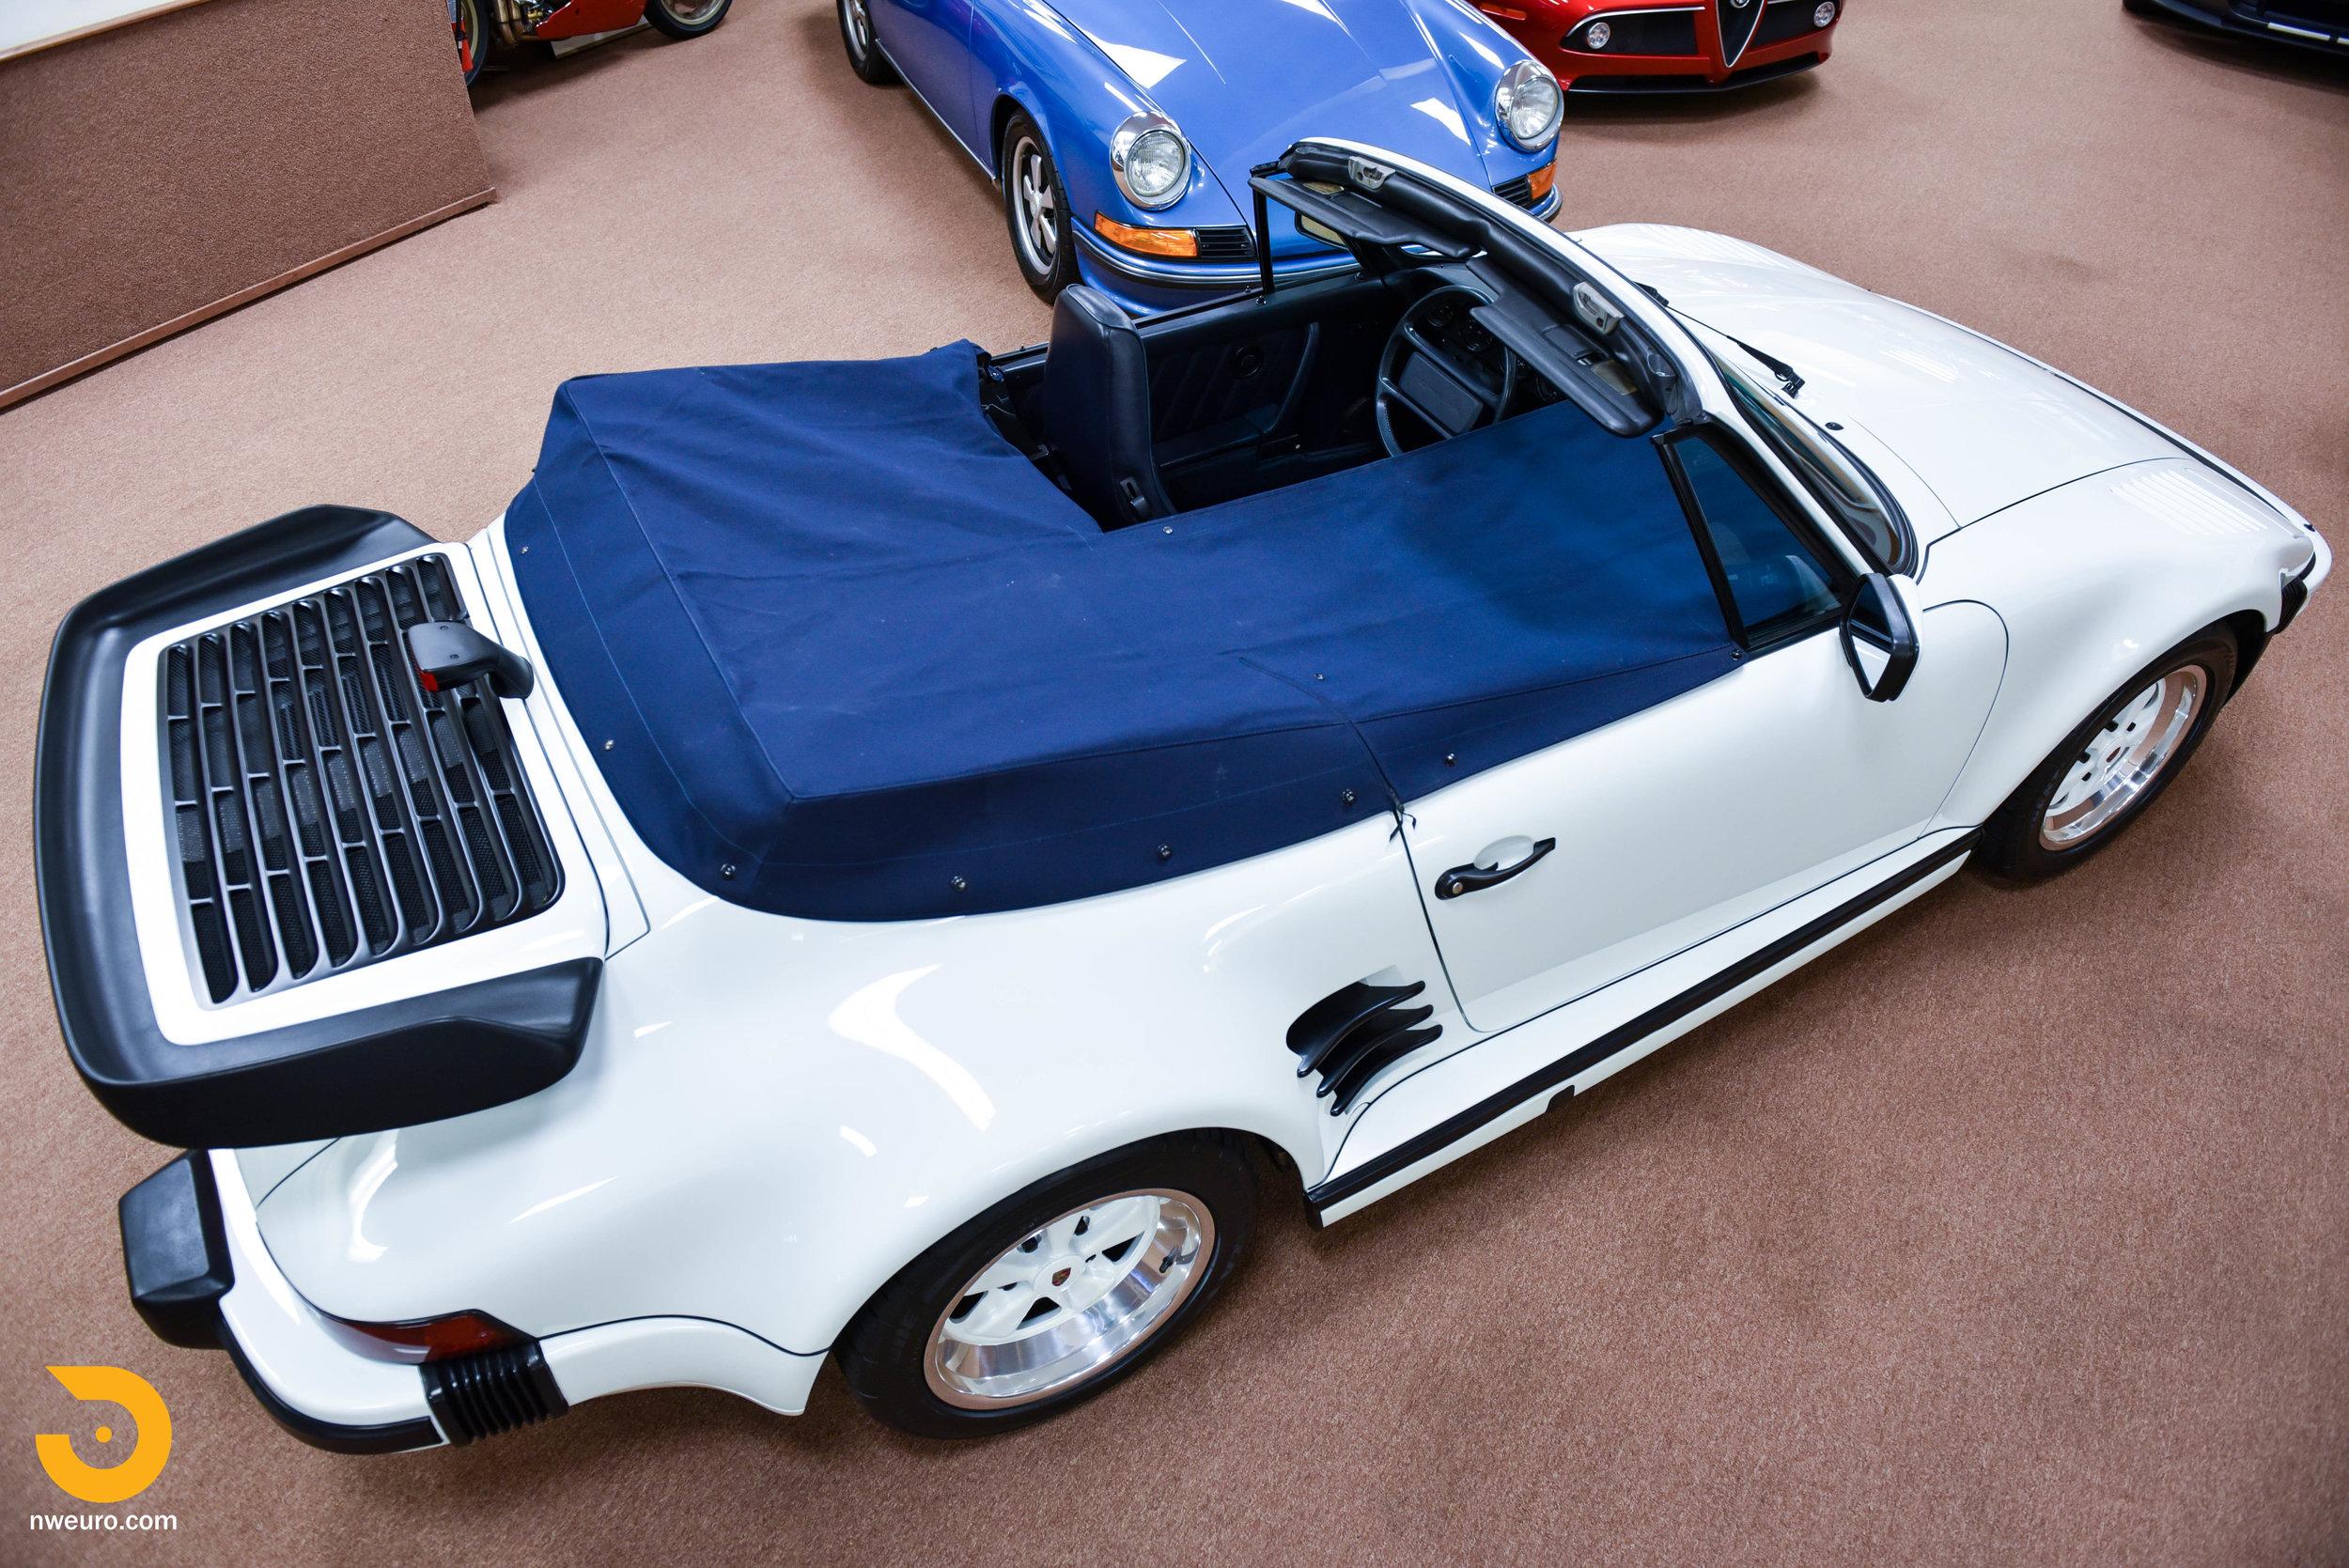 1987 Porsche 930 Slant Nose Cab Details-22.jpg